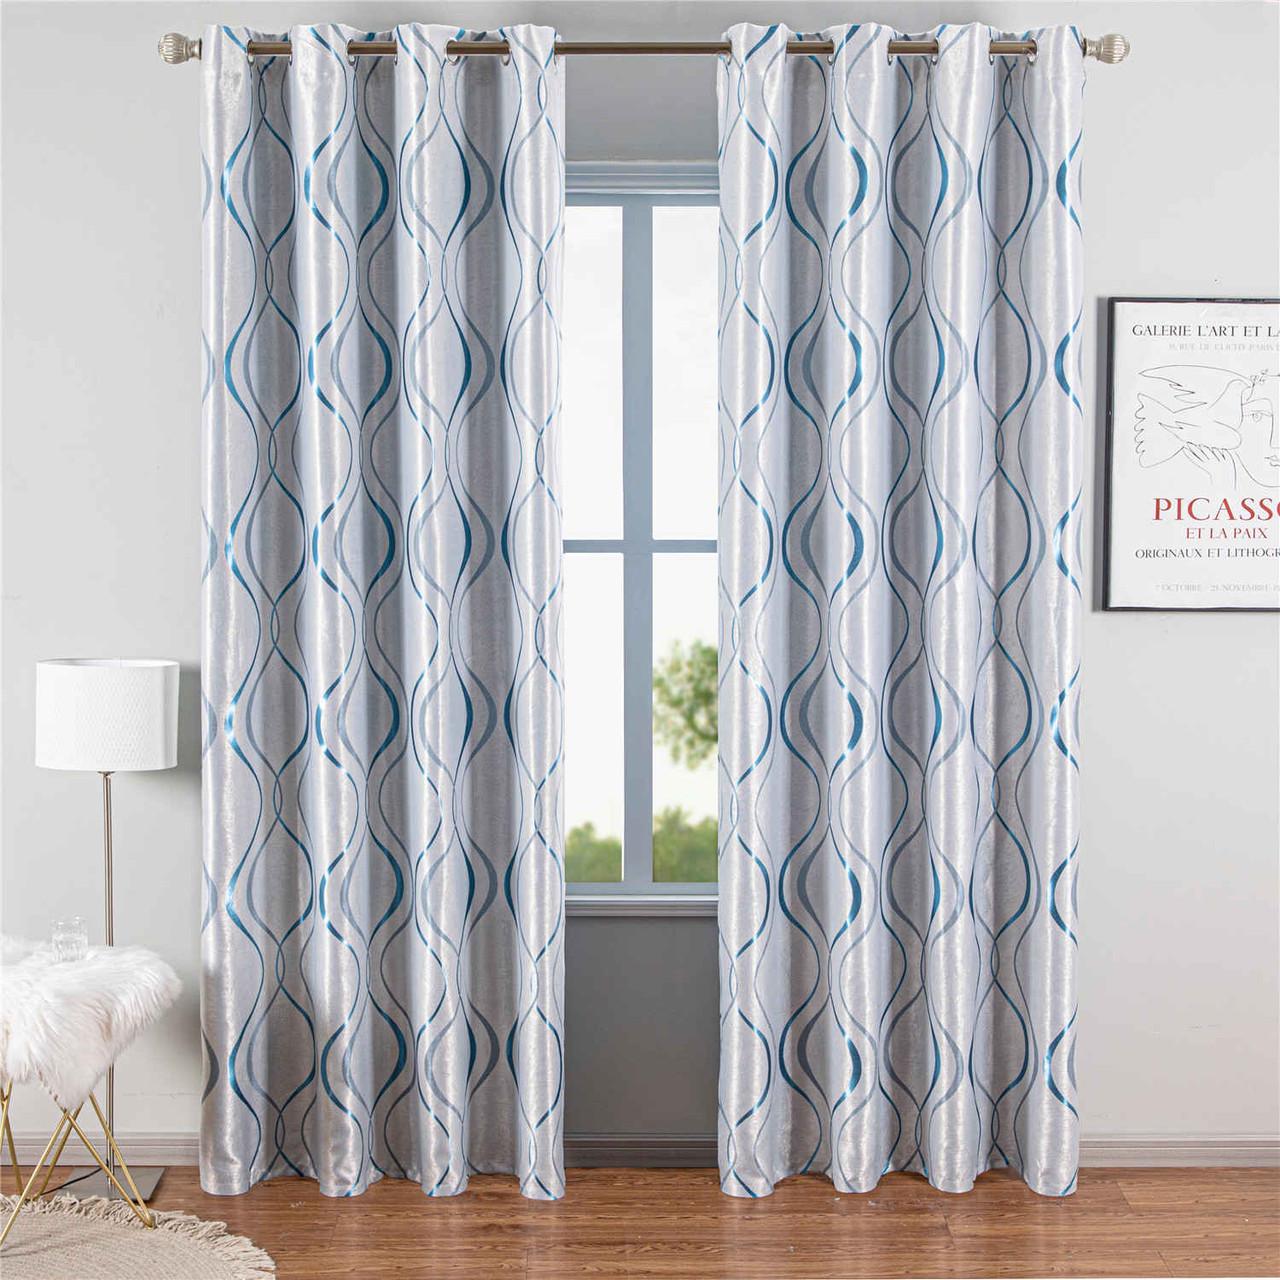 Curtain Panel Semi-Blackout Drapes, DMC498 Dolce Mela Odesa Window Treatments